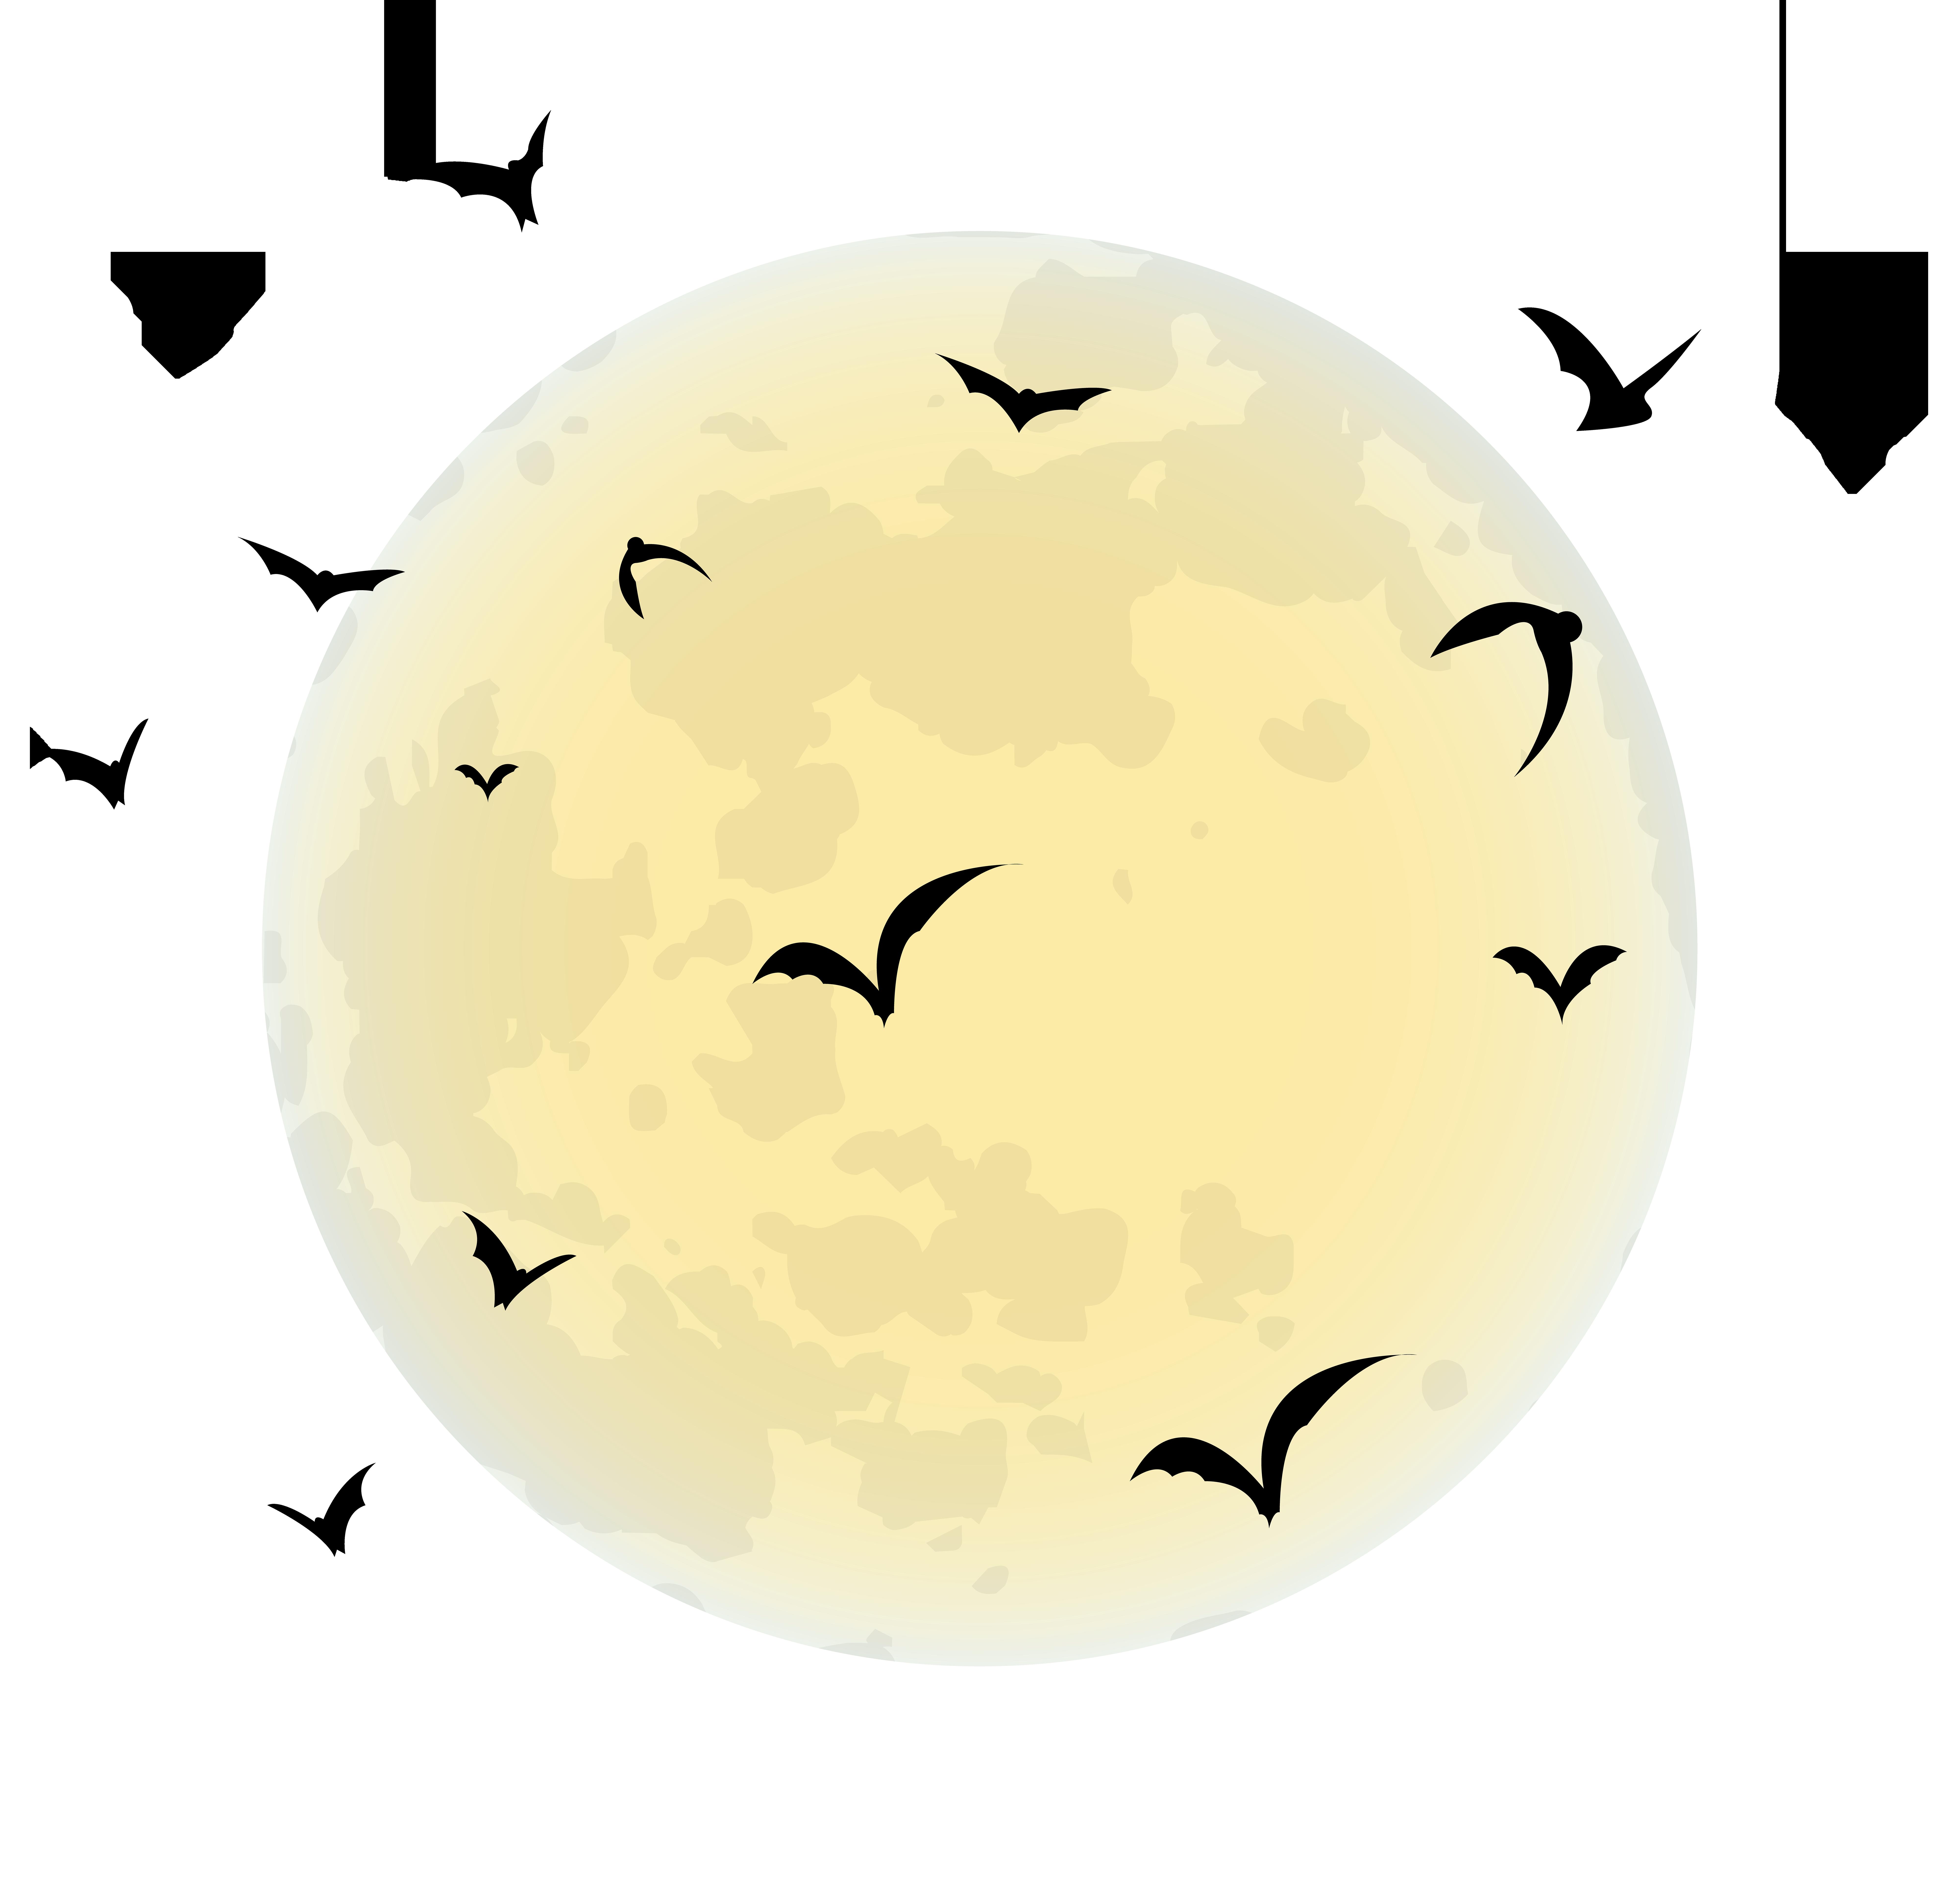 Png clip art image. Clipart halloween moon